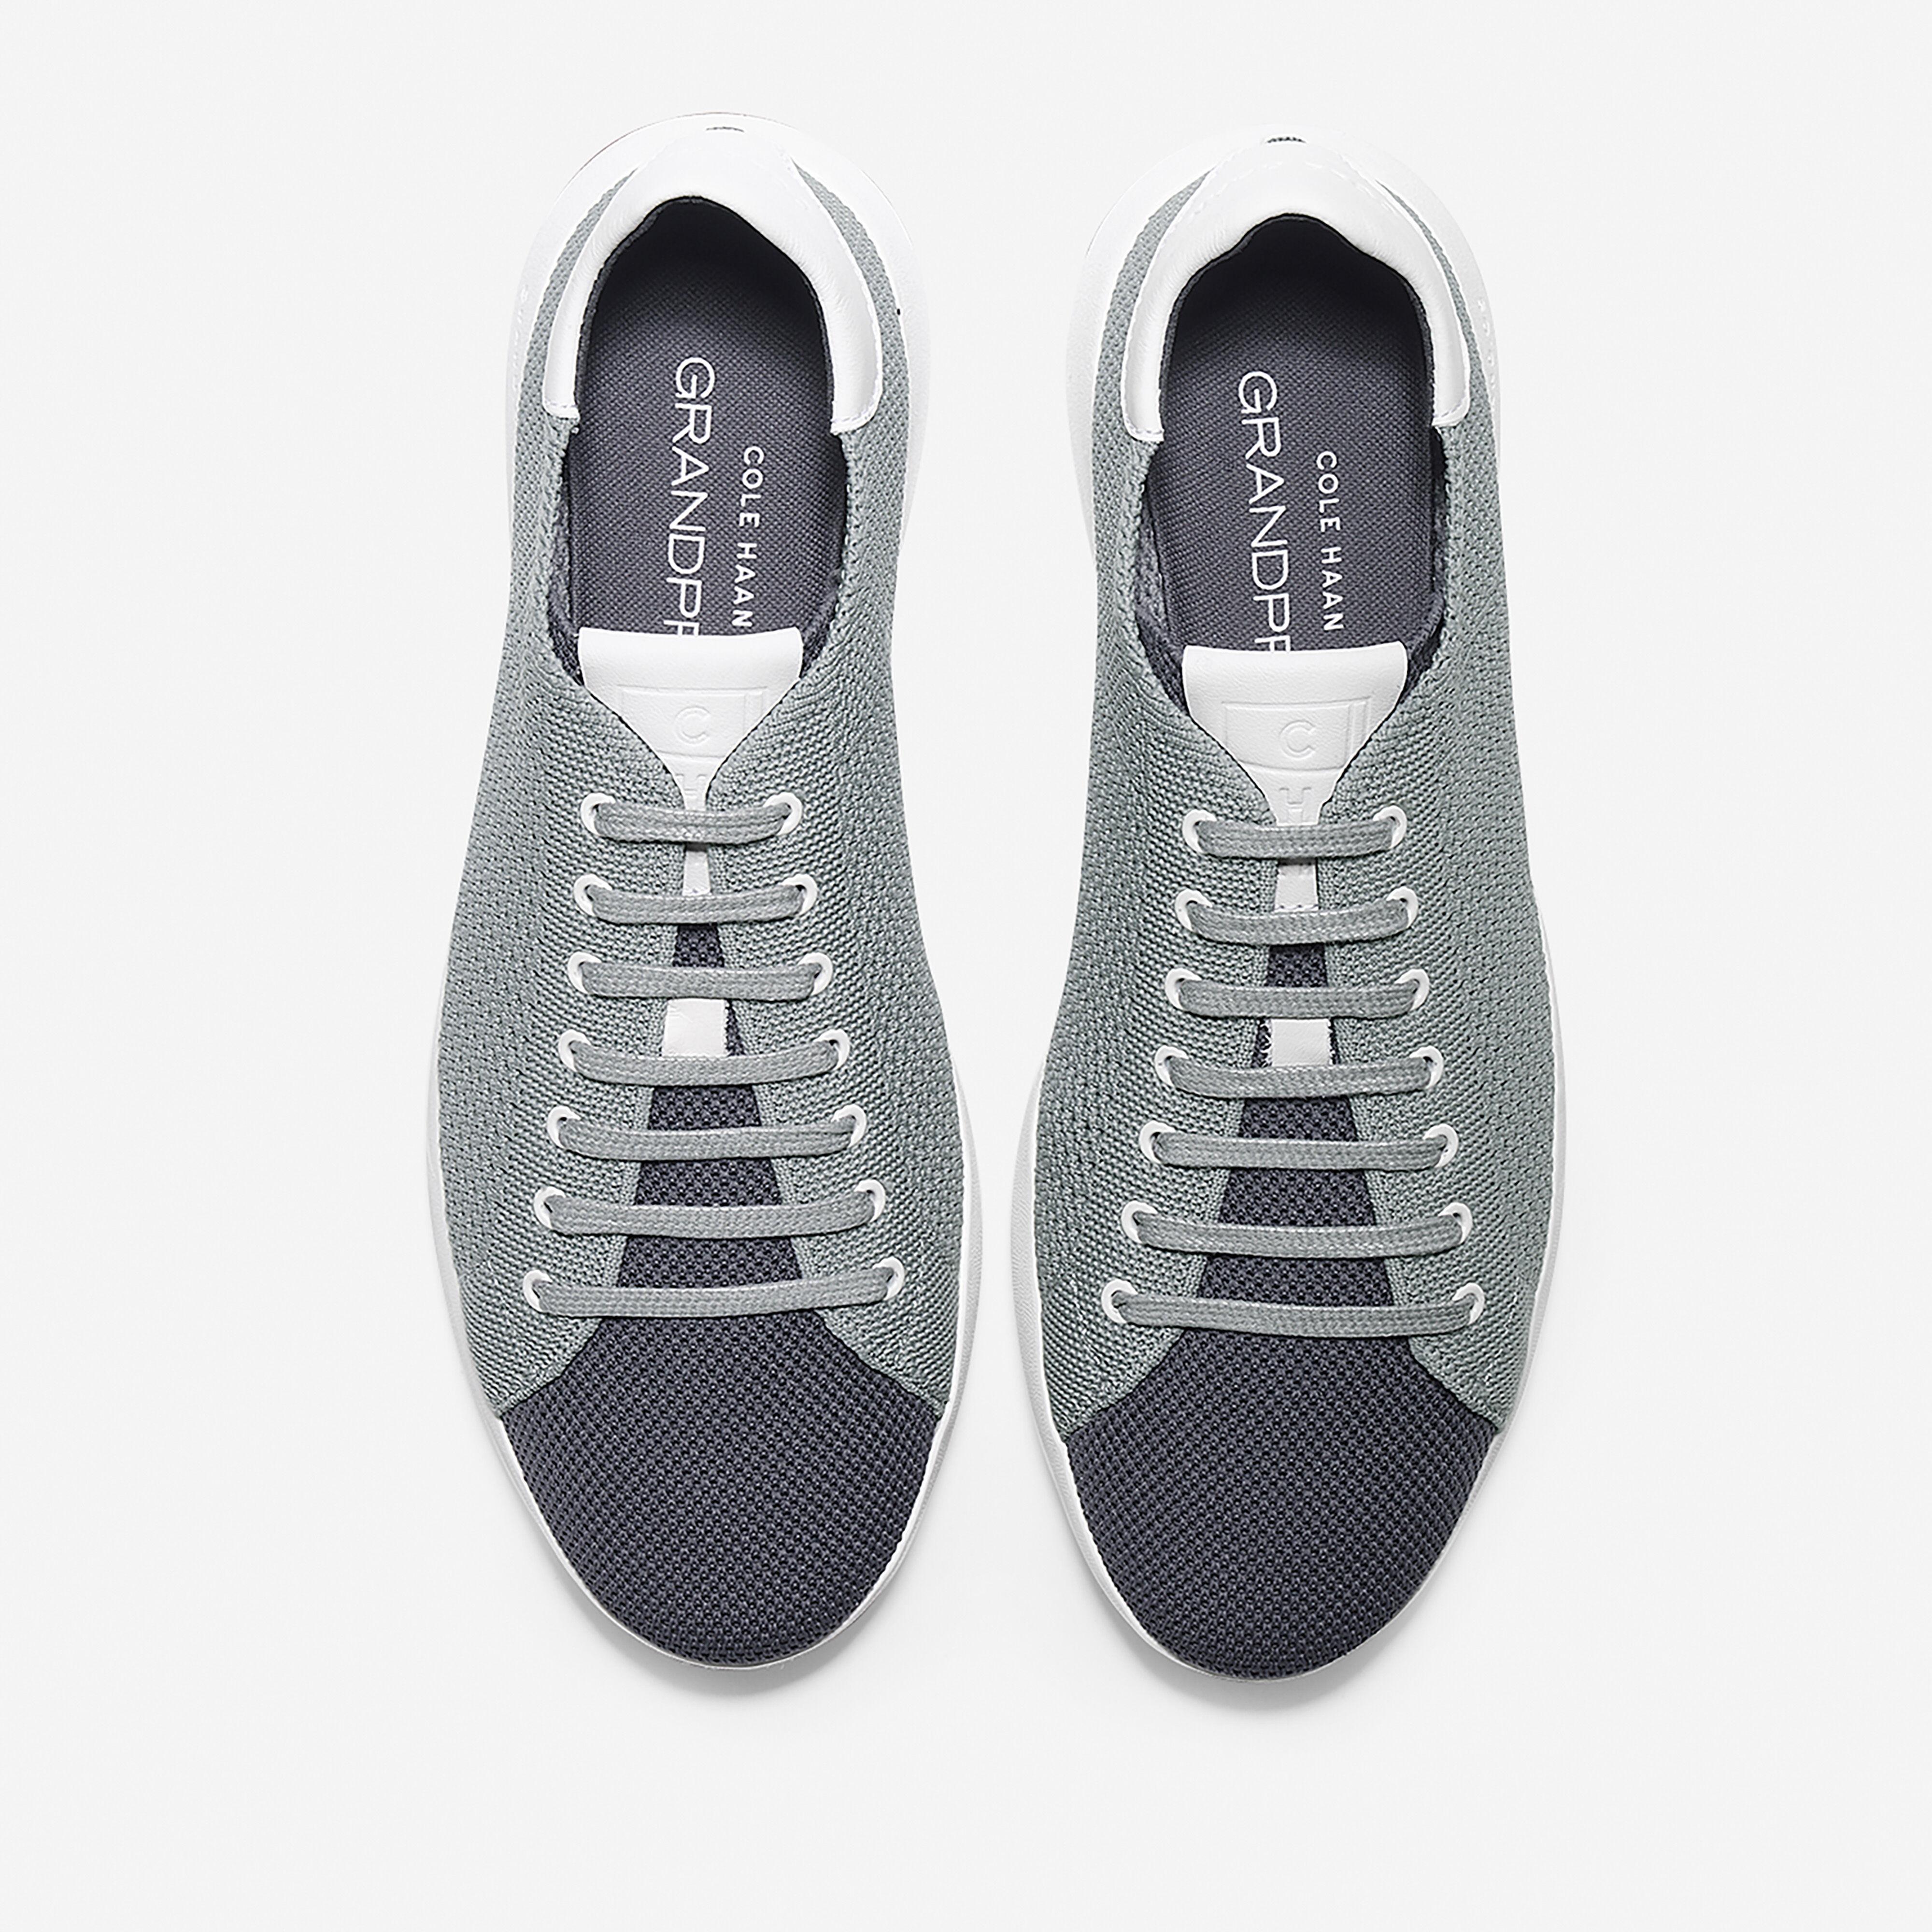 Cole Haan GrandPro Tennis Stitchlite Sneakers yr3Czpk